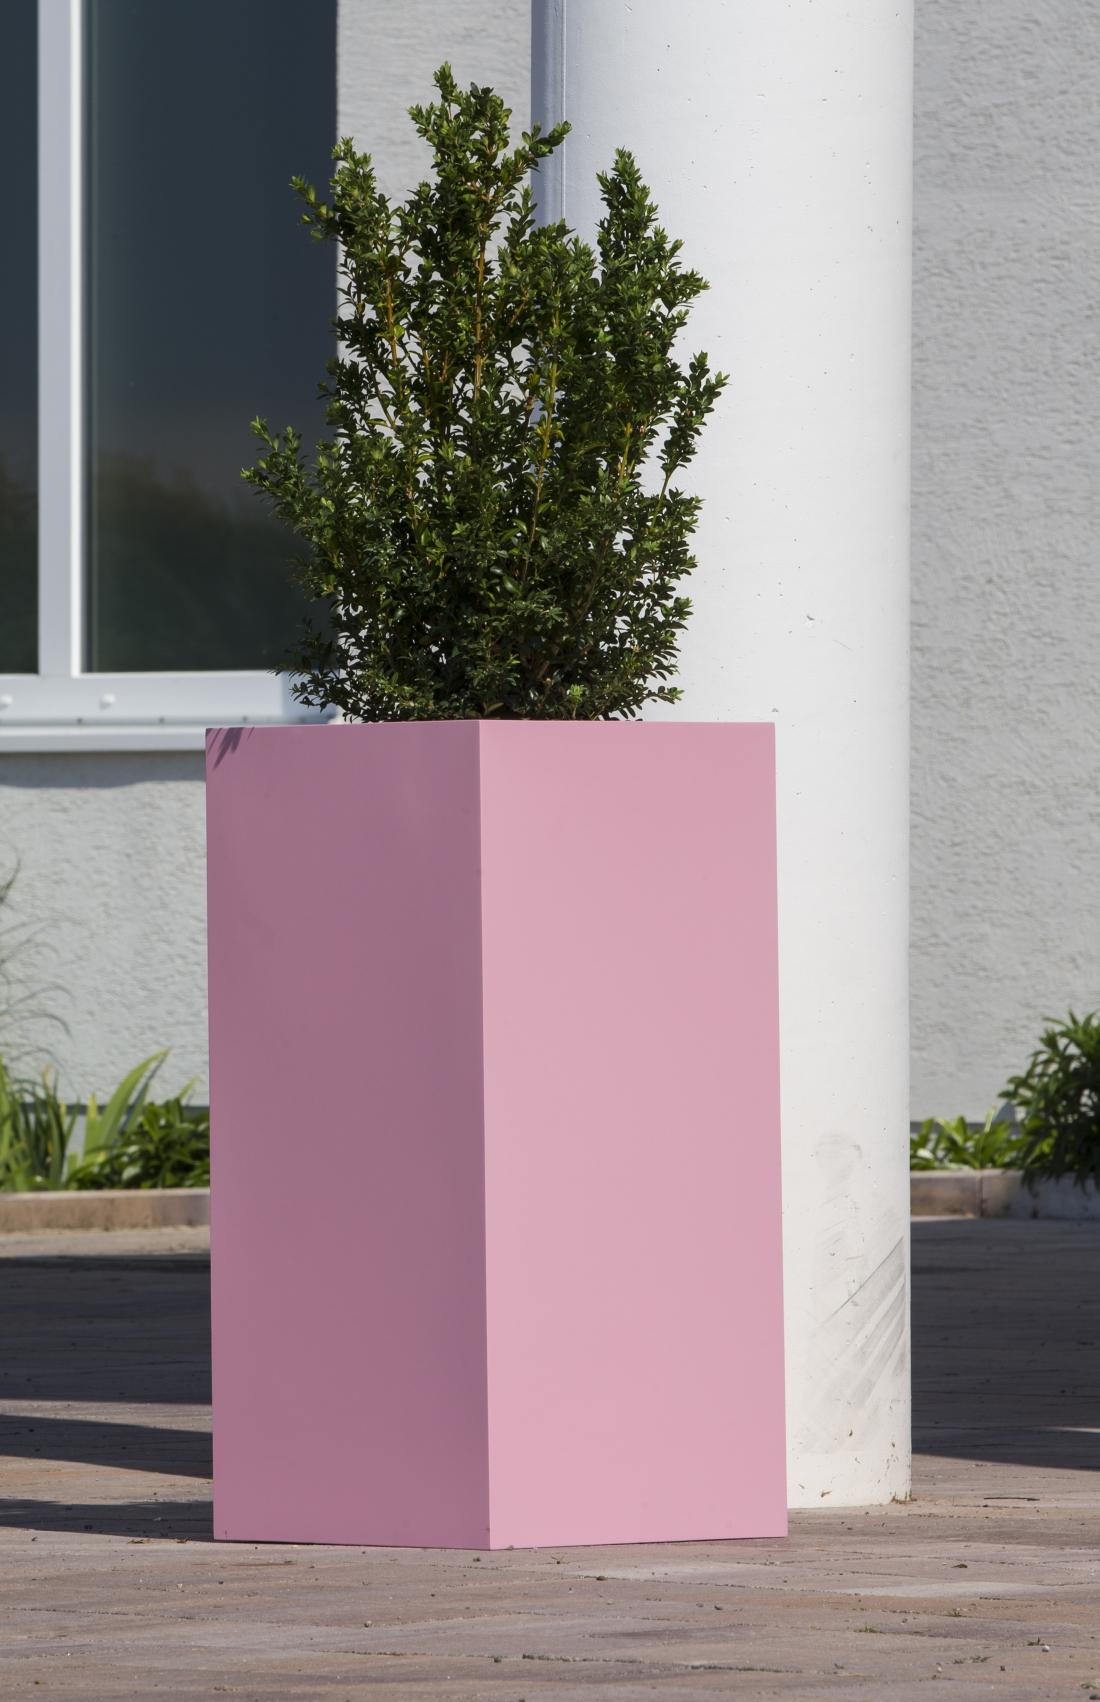 garten im quadrat florum leichtes pflanzgef aus fiberglas kunststoff in 213 ral farben. Black Bedroom Furniture Sets. Home Design Ideas